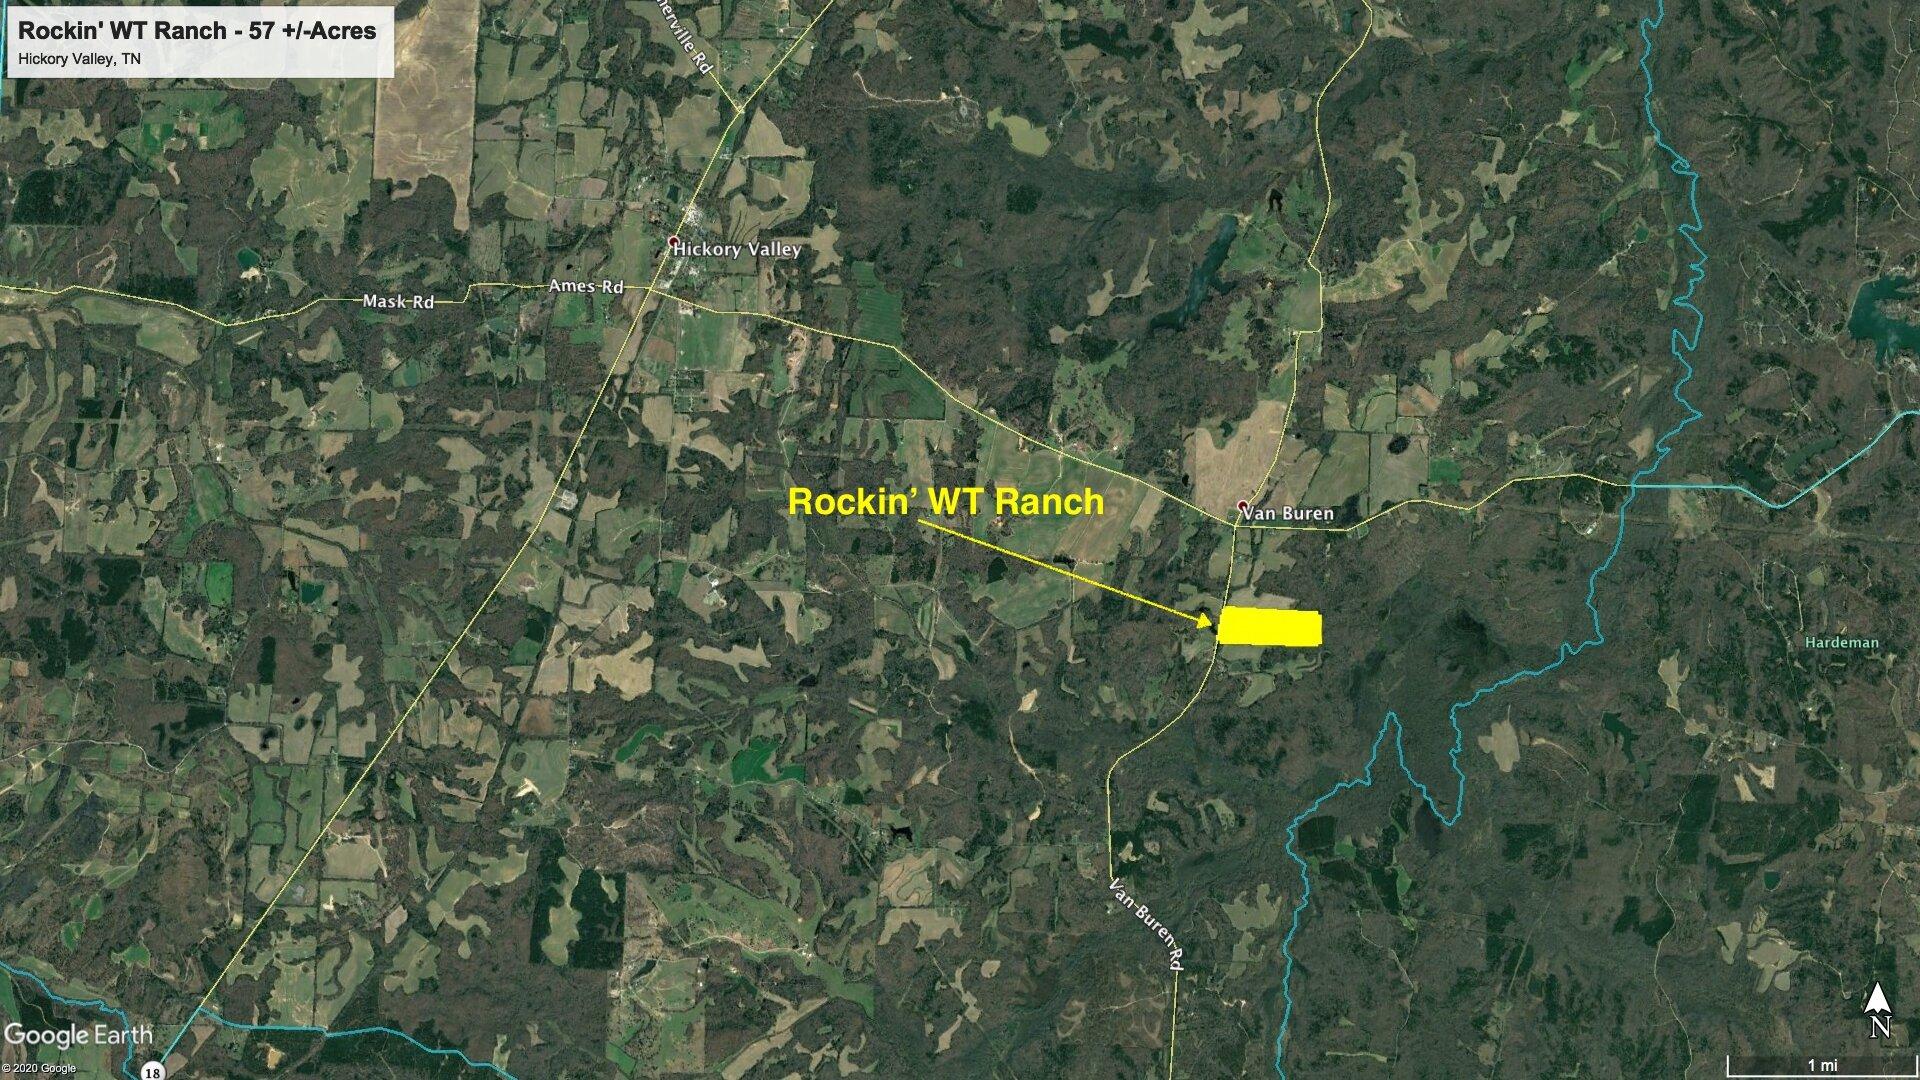 Rockin' WT Ranch - 57+:- Acres -Mid View.jpg